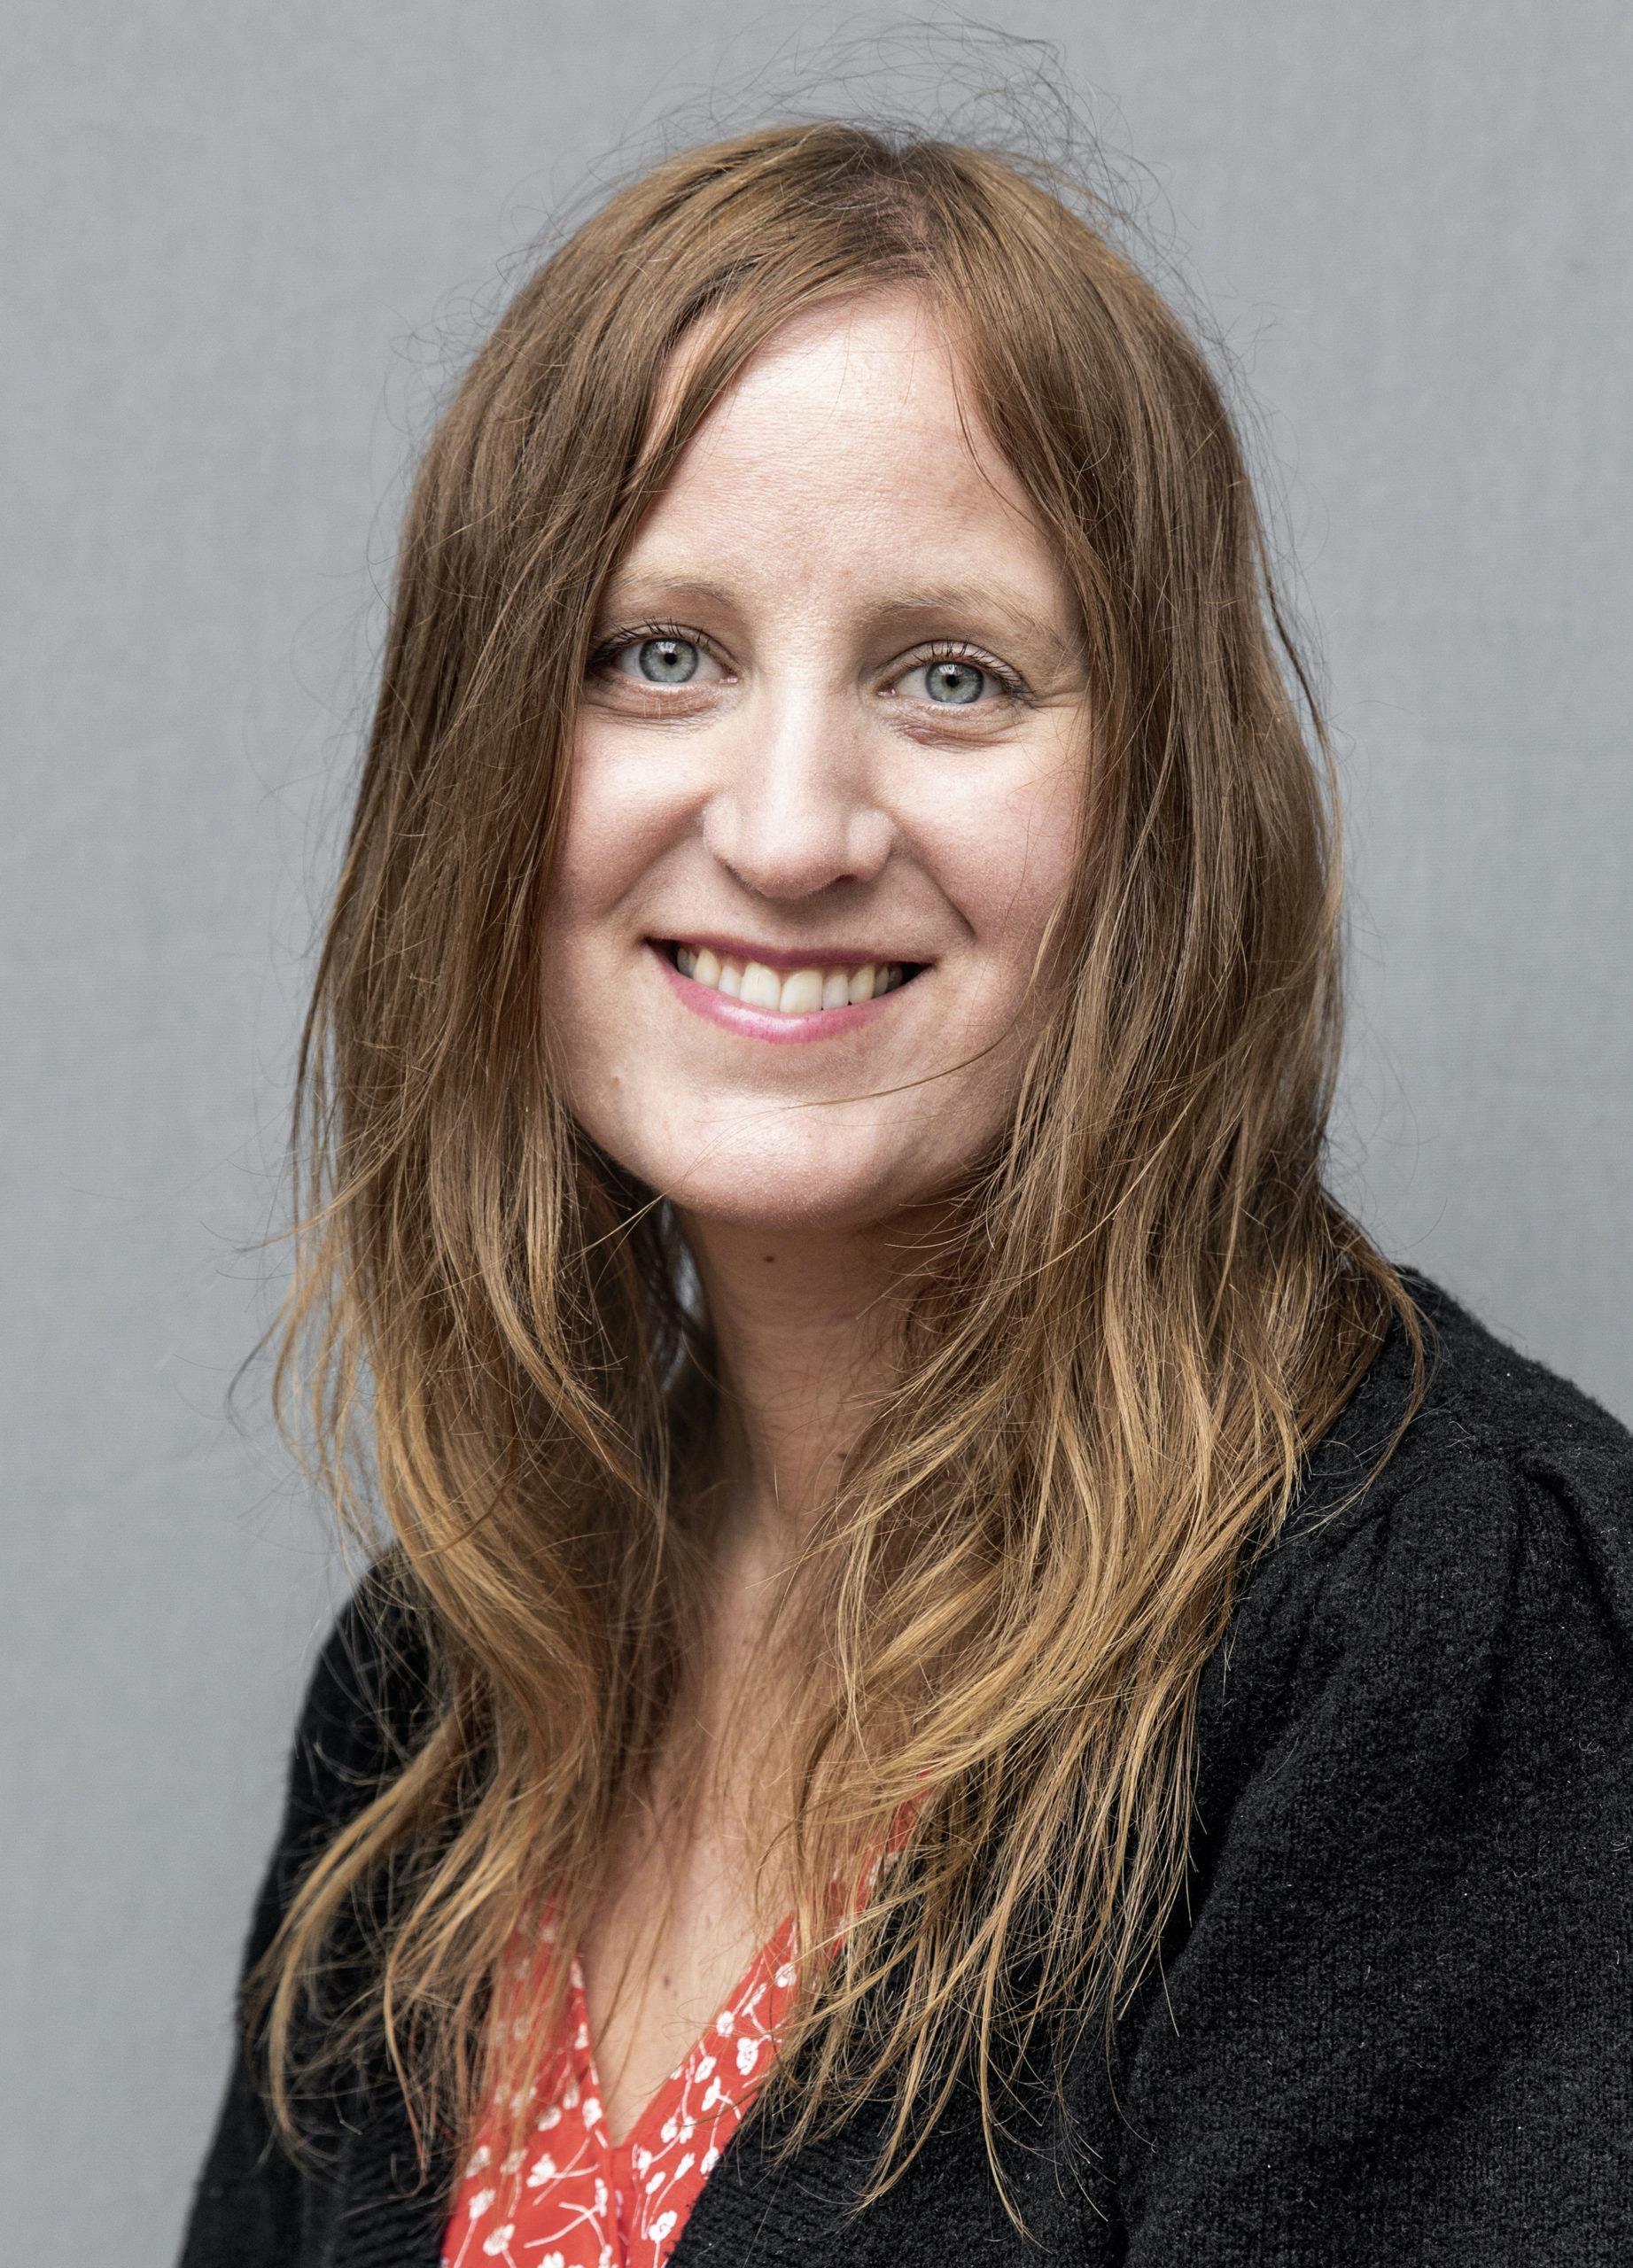 Sara Thorstensson